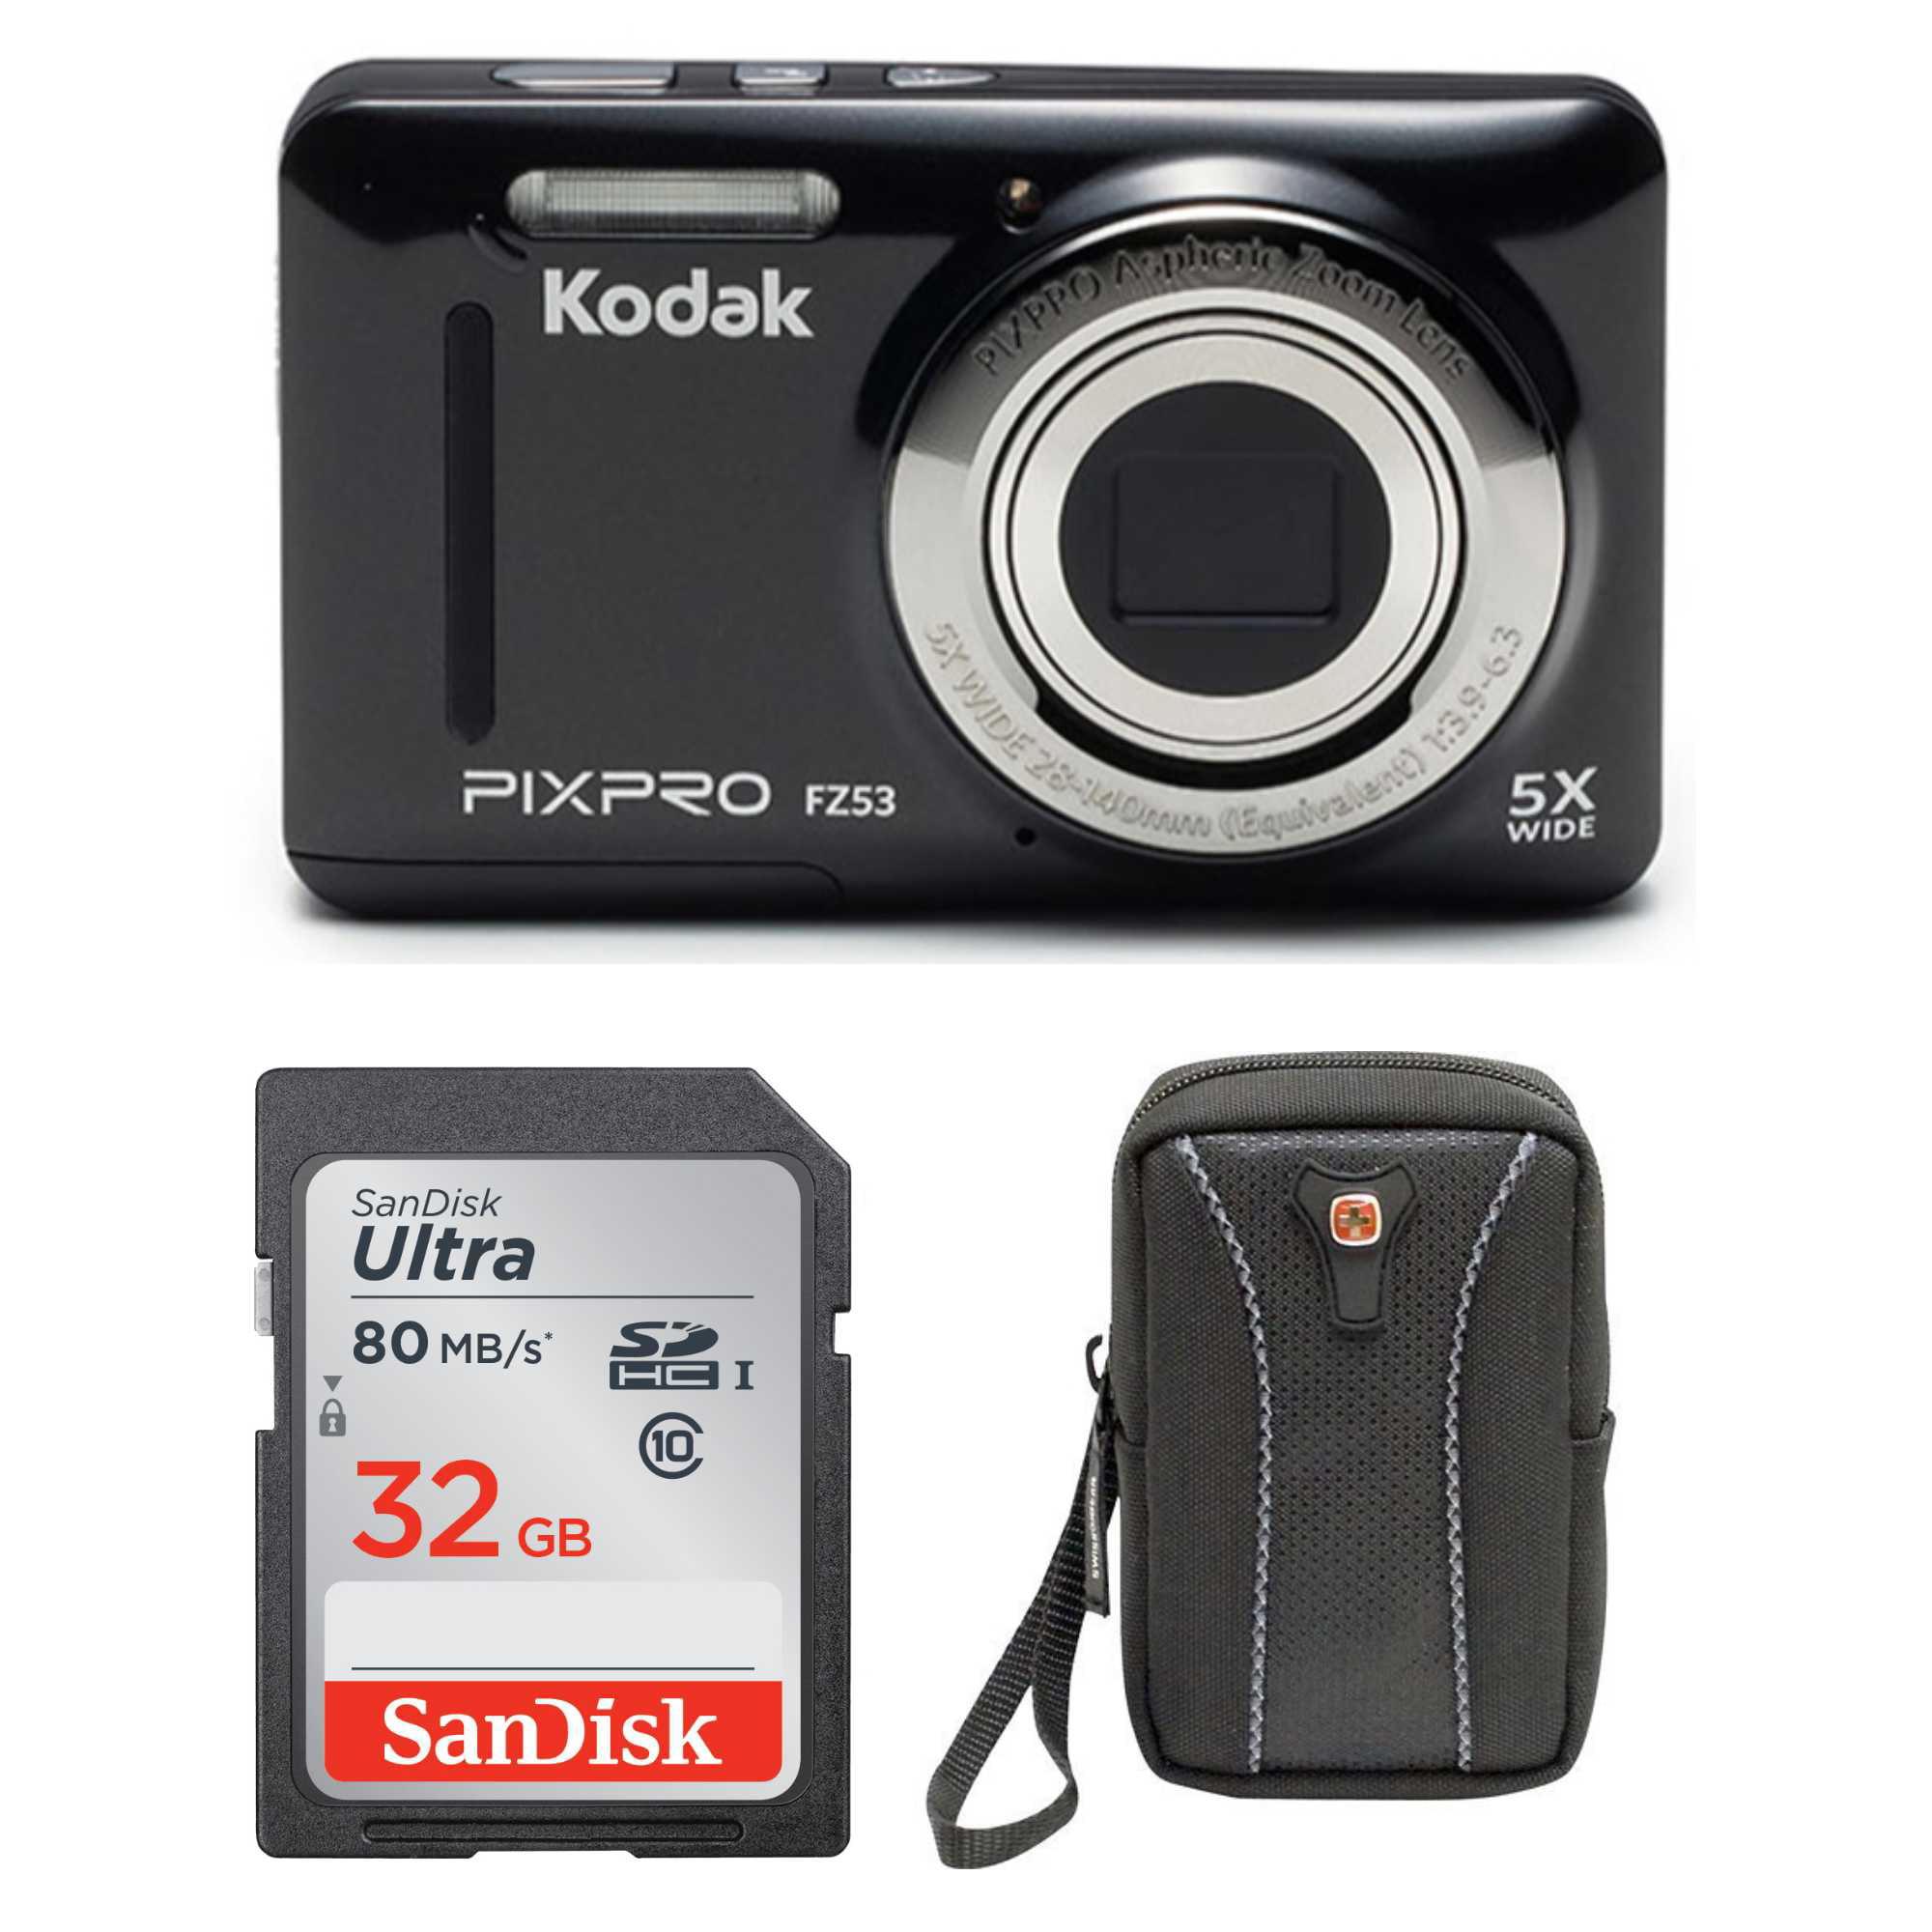 "Kodak PIXPRO Friendly Zoom FZ53 16 MP 5X Optical Zoom and 2.7"" 32GB Bundle"